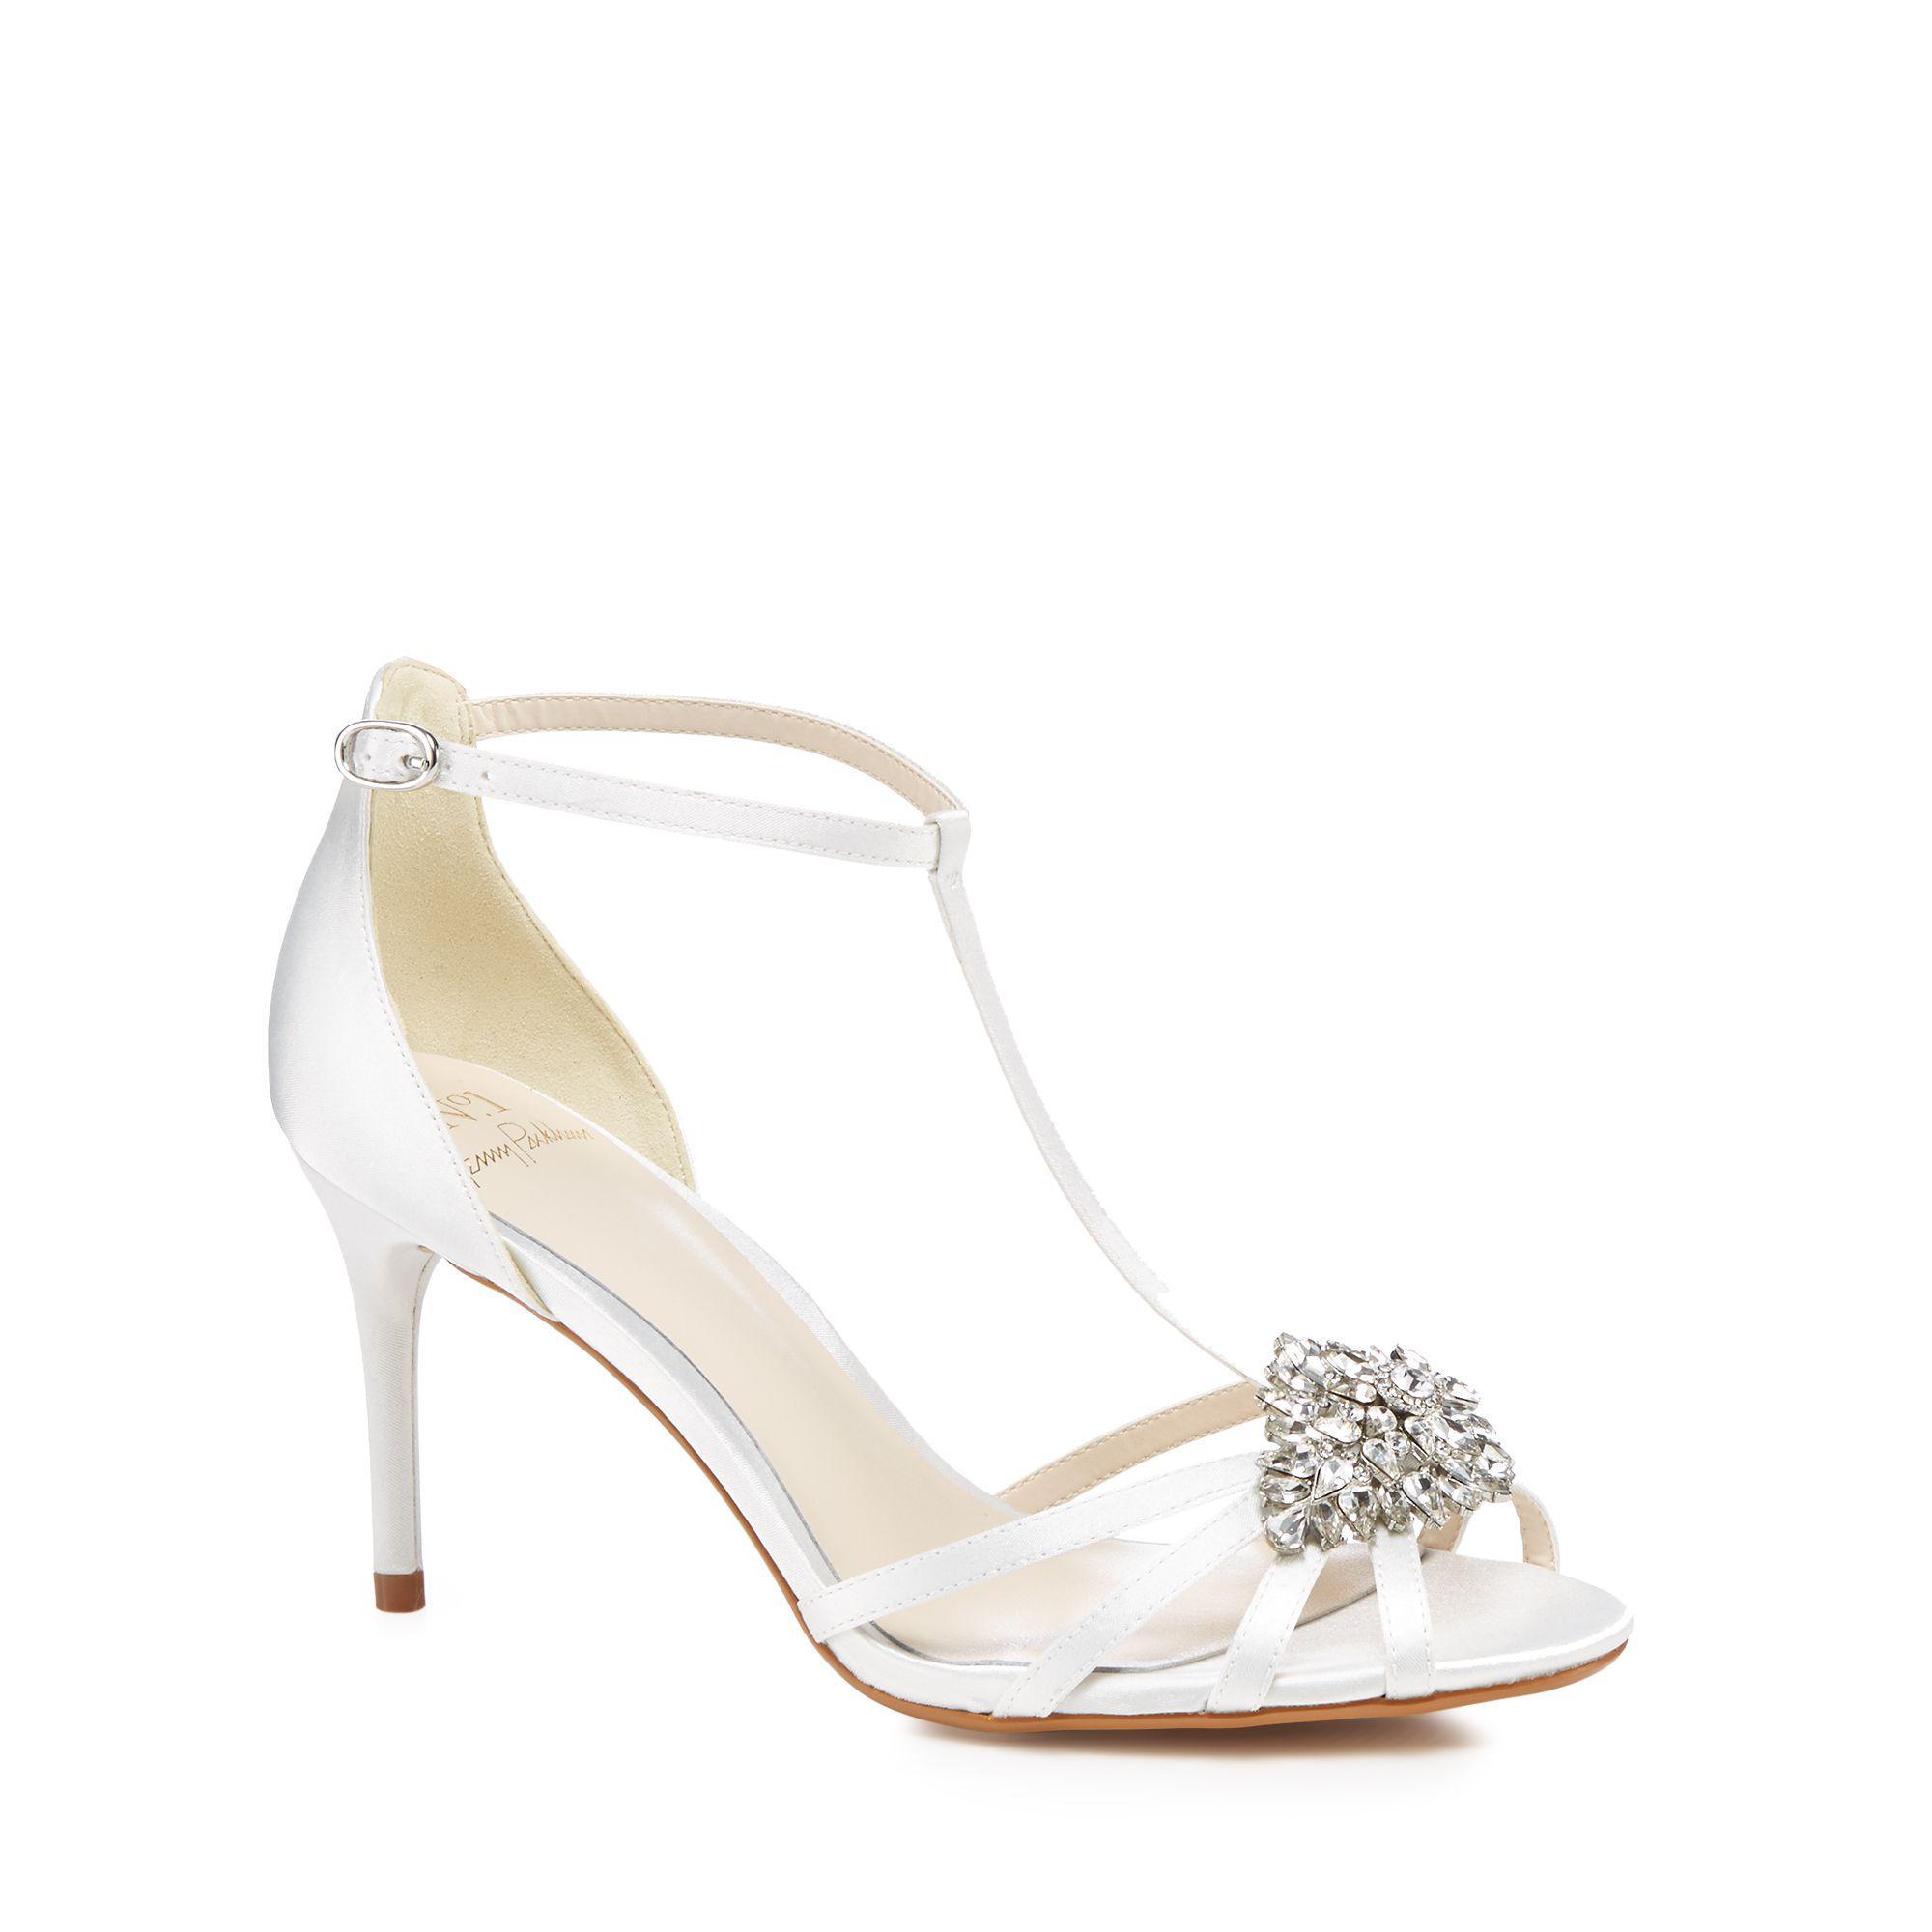 50ab0a7d2cf0 Jenny Packham. Women s White Ivory Satin  perdita  High Stiletto Heel T-bar  Sandals